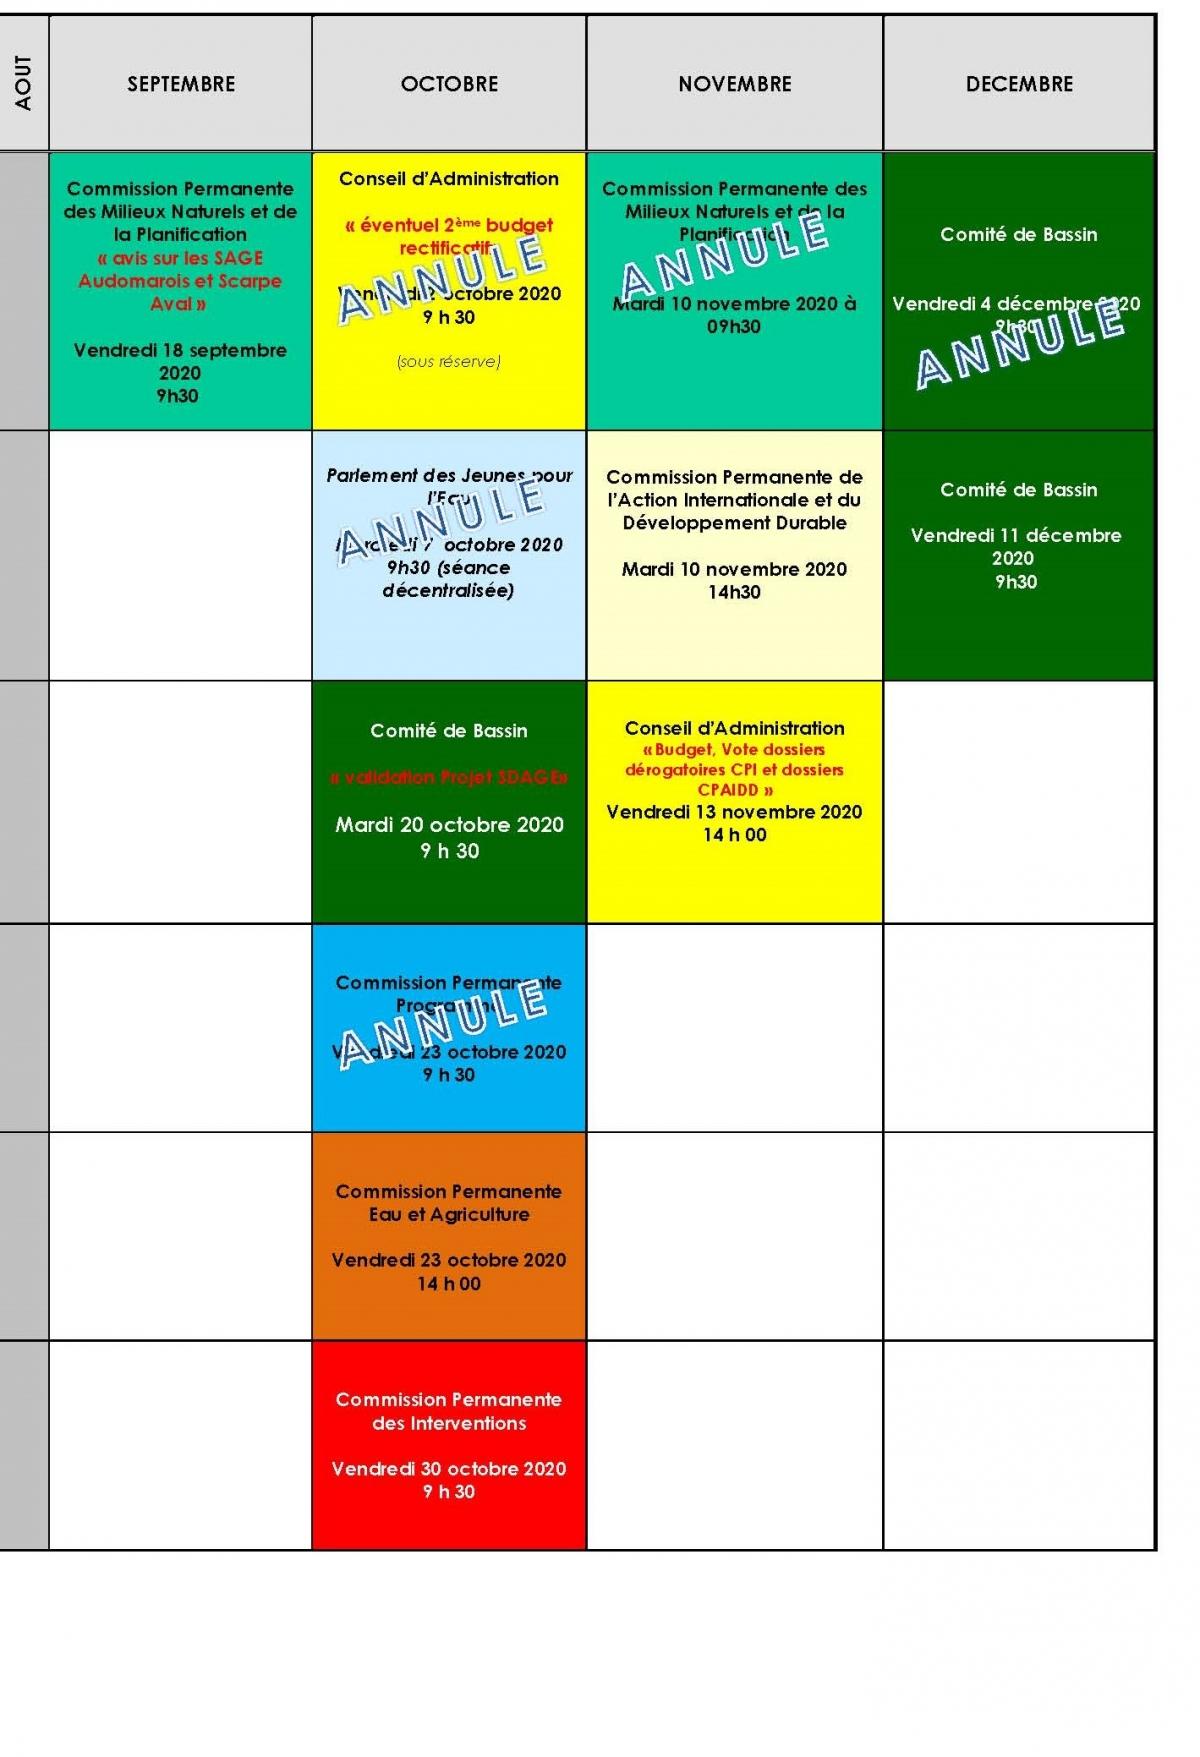 calendrier_des_instances_de_bassin_2020_-interne_-_modif_04_11_2020_2eme_semestre-_sans_pre_ca.jpg